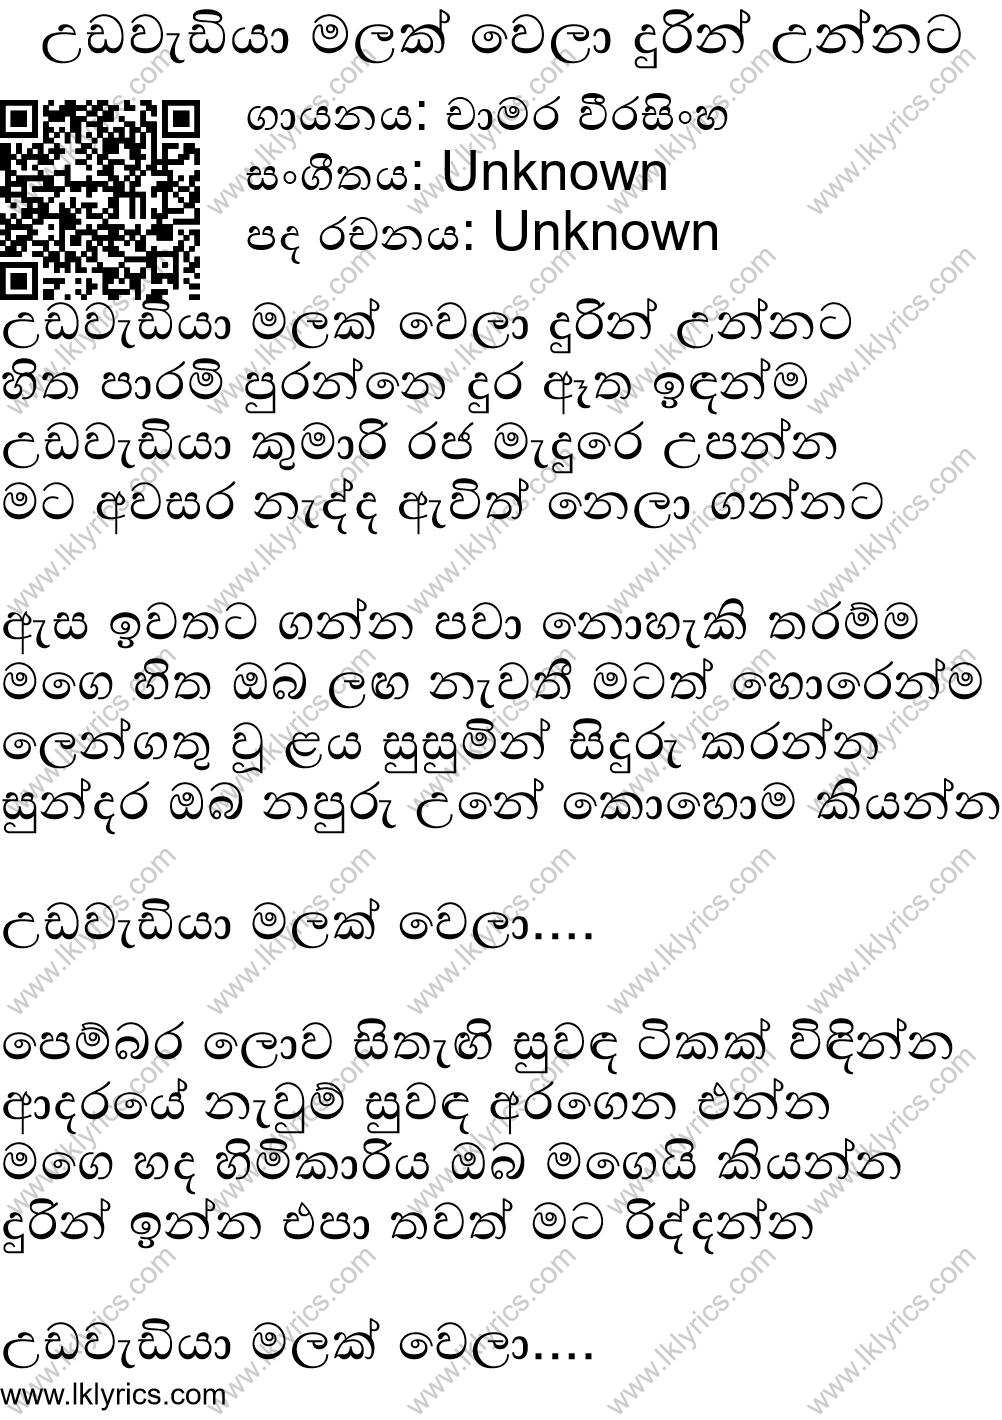 Ira Pupuranawalu Song Lyrics